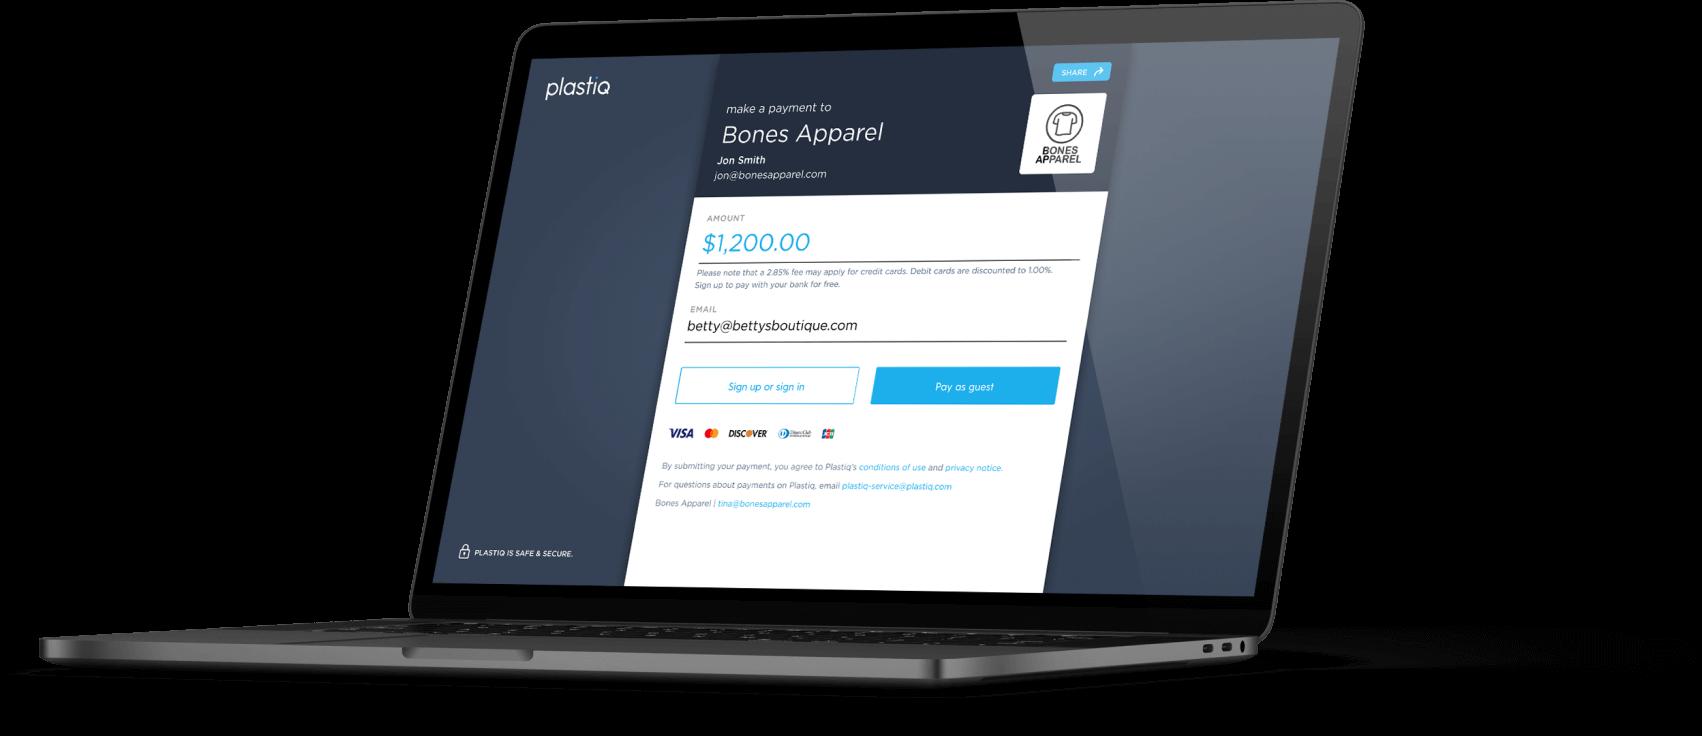 macbook-left-make-a-payment-2-opt